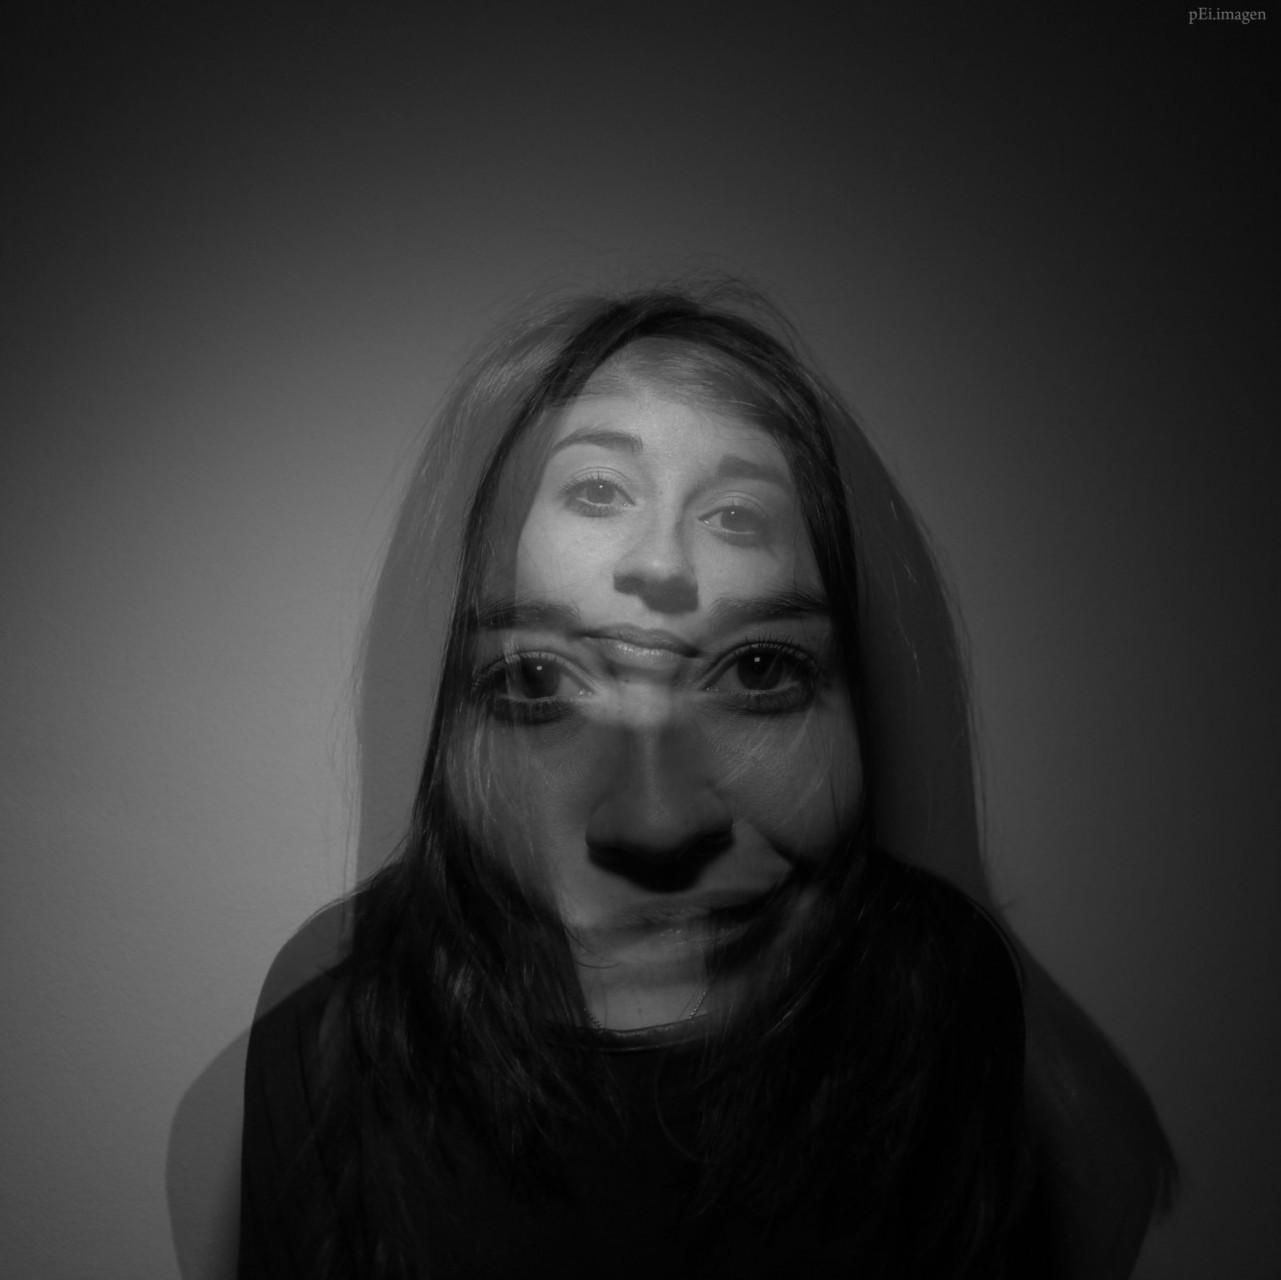 peipegata me myself I proyectos fotografia peipegatafotografia # 026 Ana Gonzalez Granja